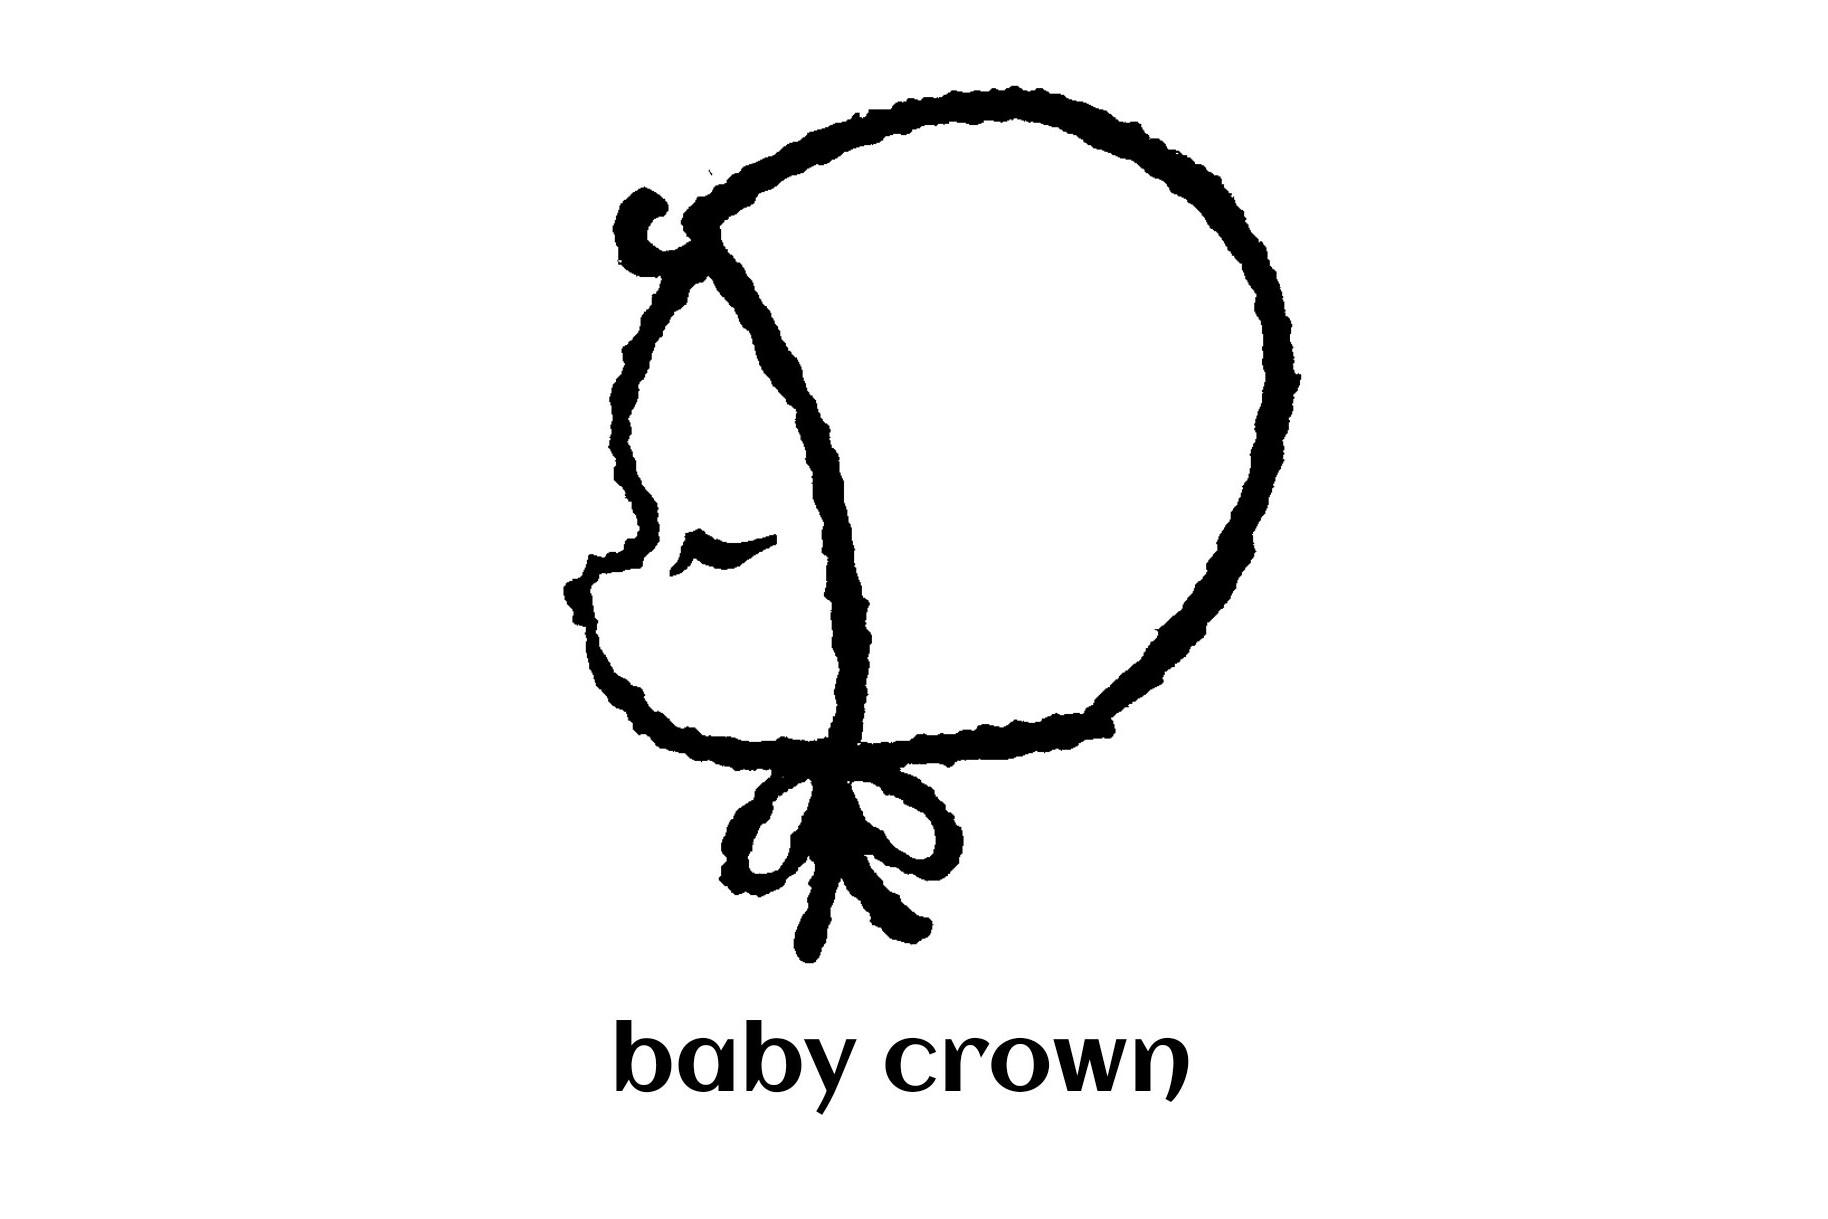 babycrown【ベビーボンネット 】【ニットボンネット】